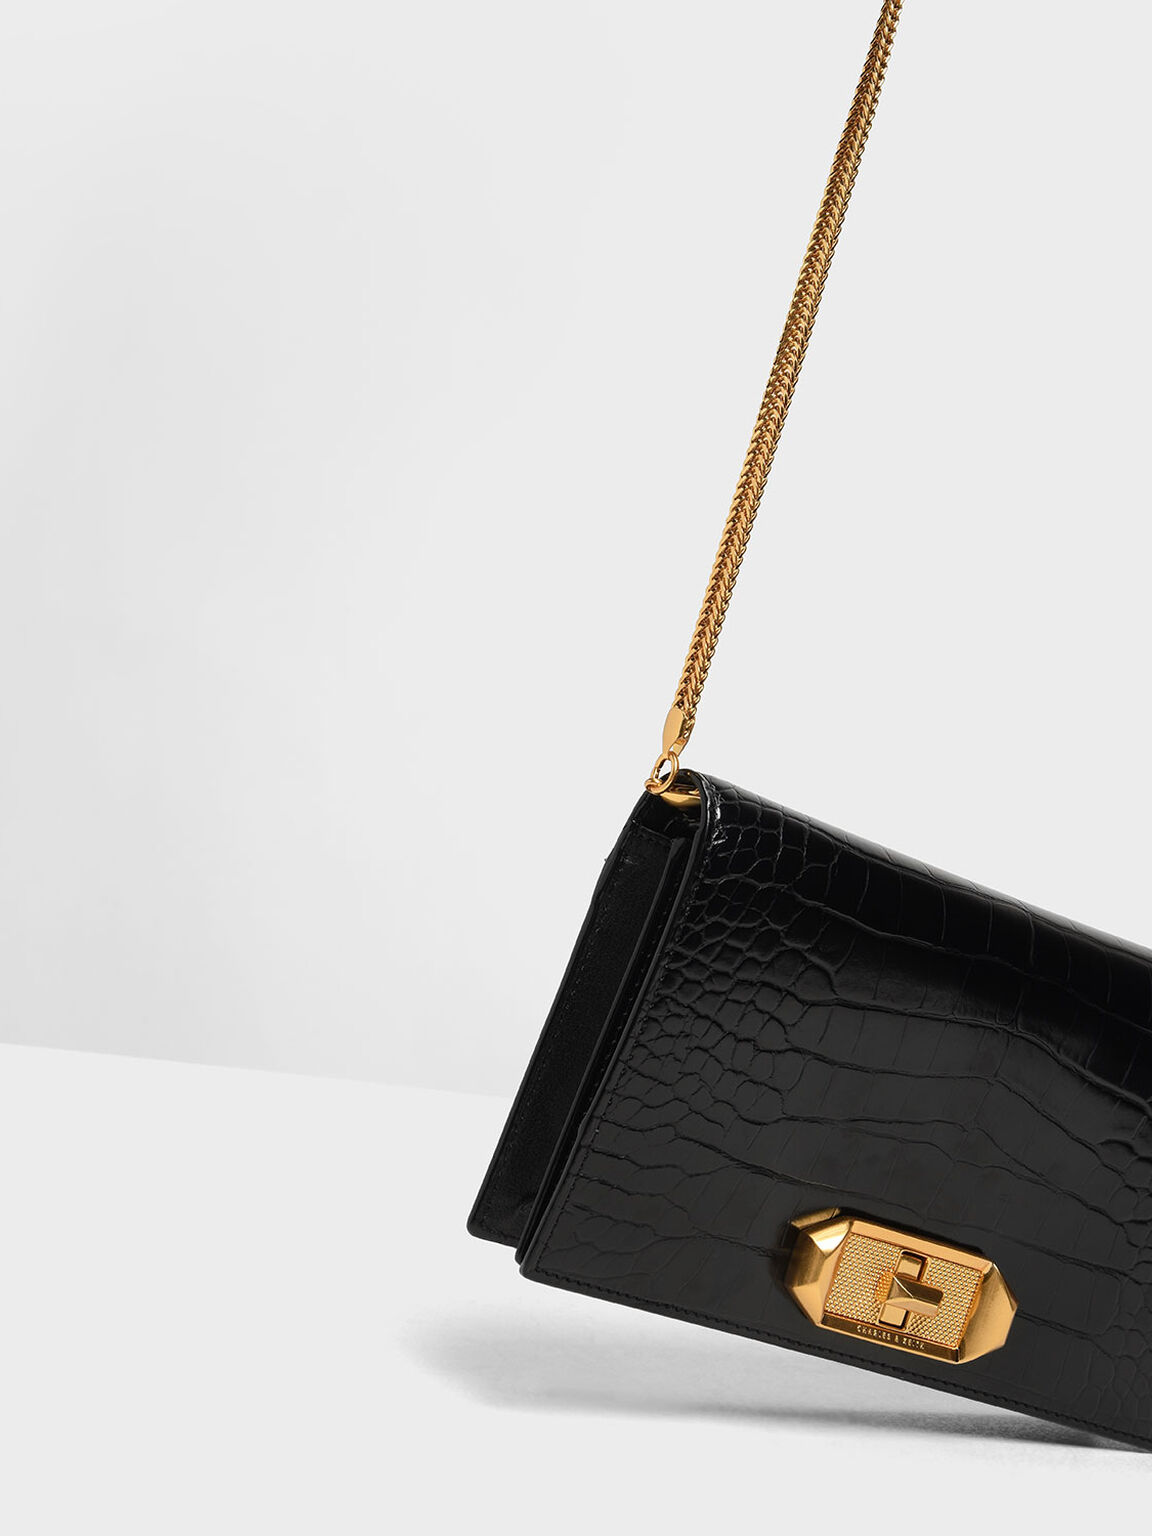 Croc-Effect Turn-lock Wallet, Black Textured, hi-res